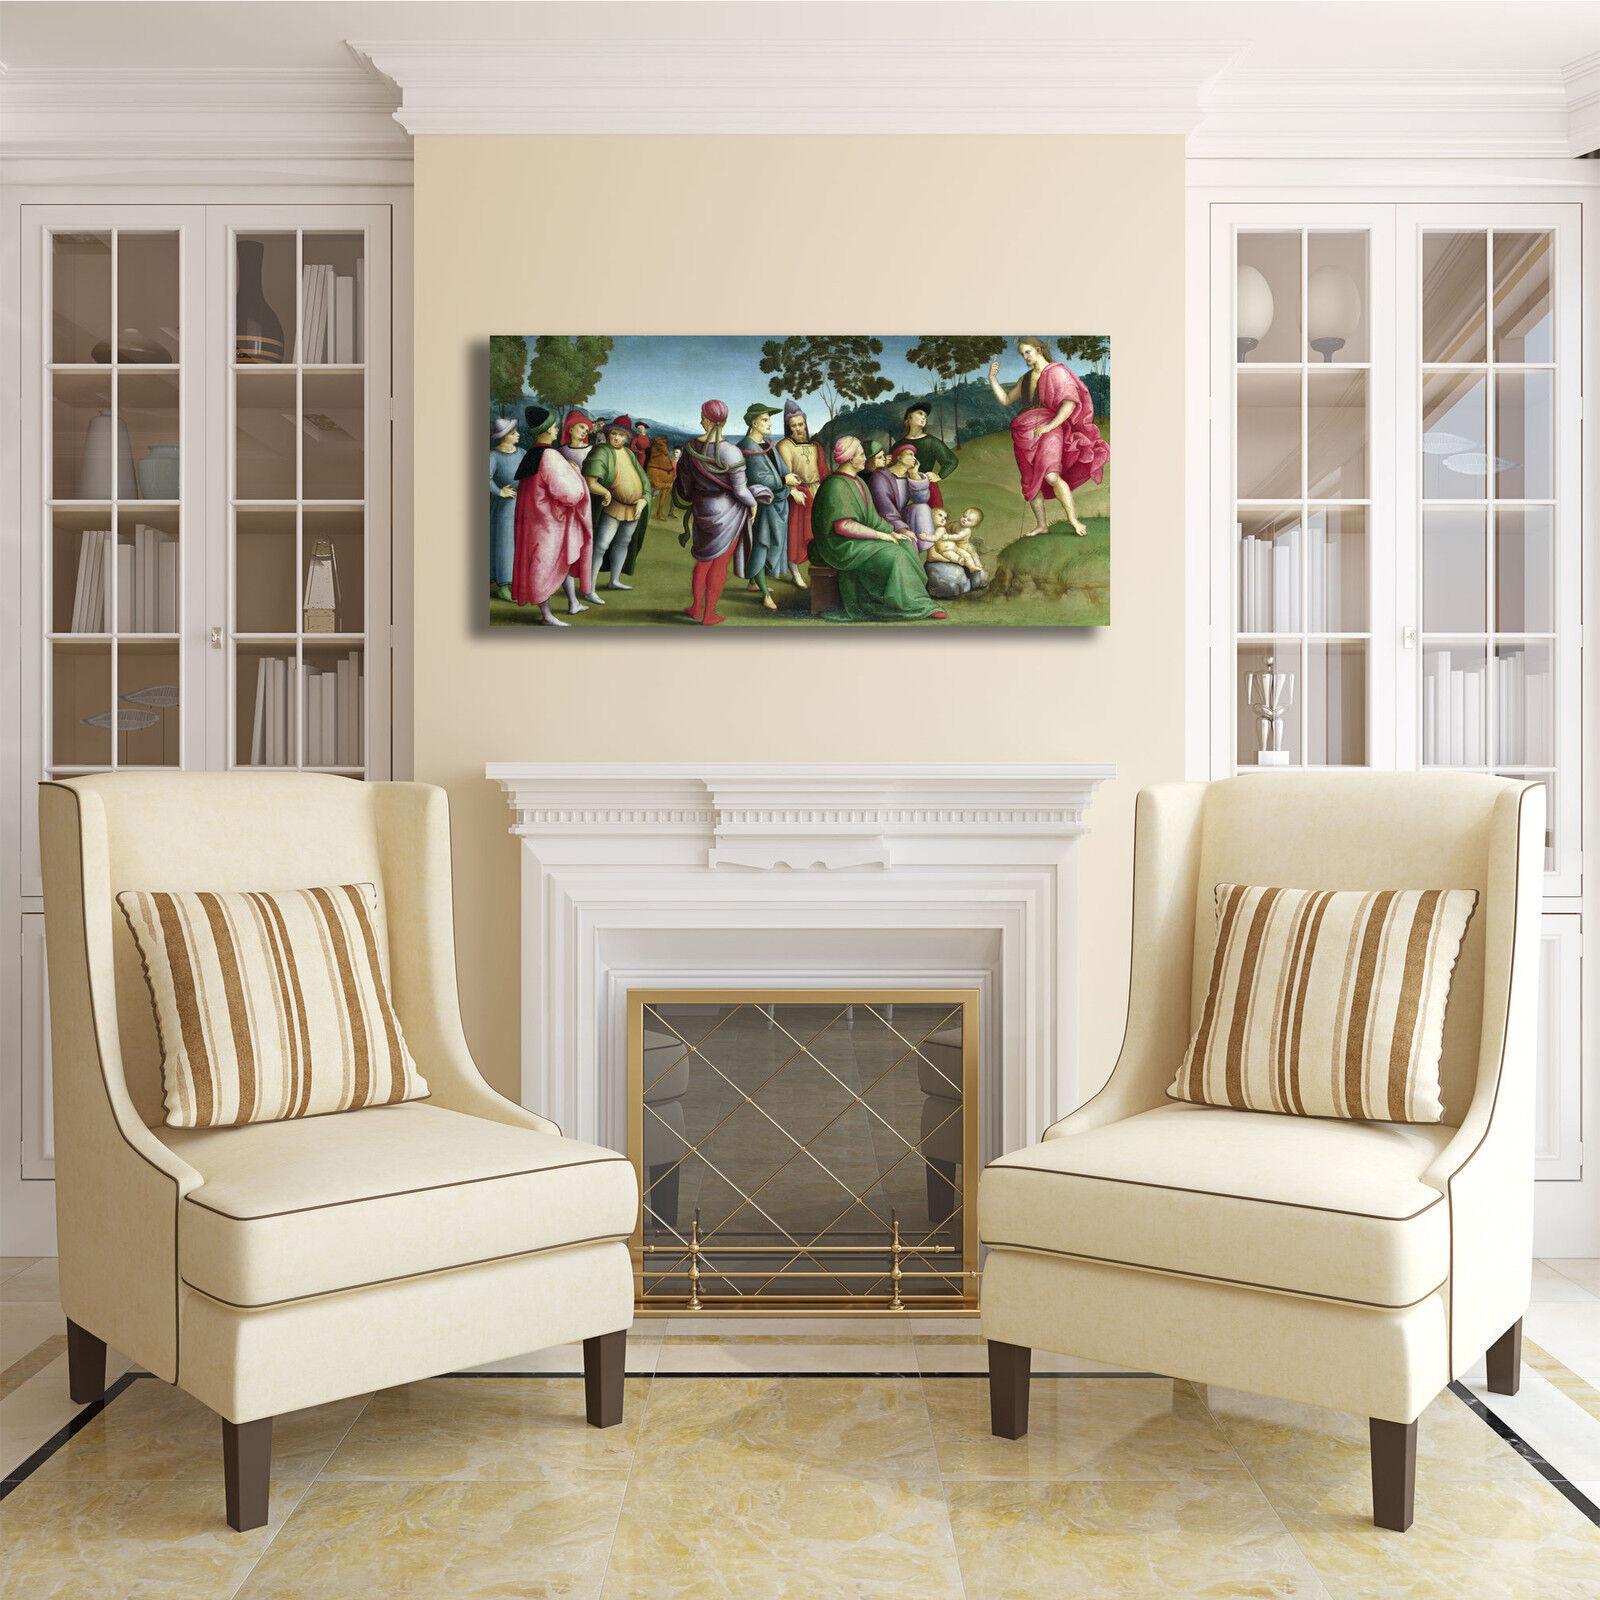 Raffaello san Giovanni Battista quadro stampa tela dipinto telaio casa arRouge o casa telaio 658ff4